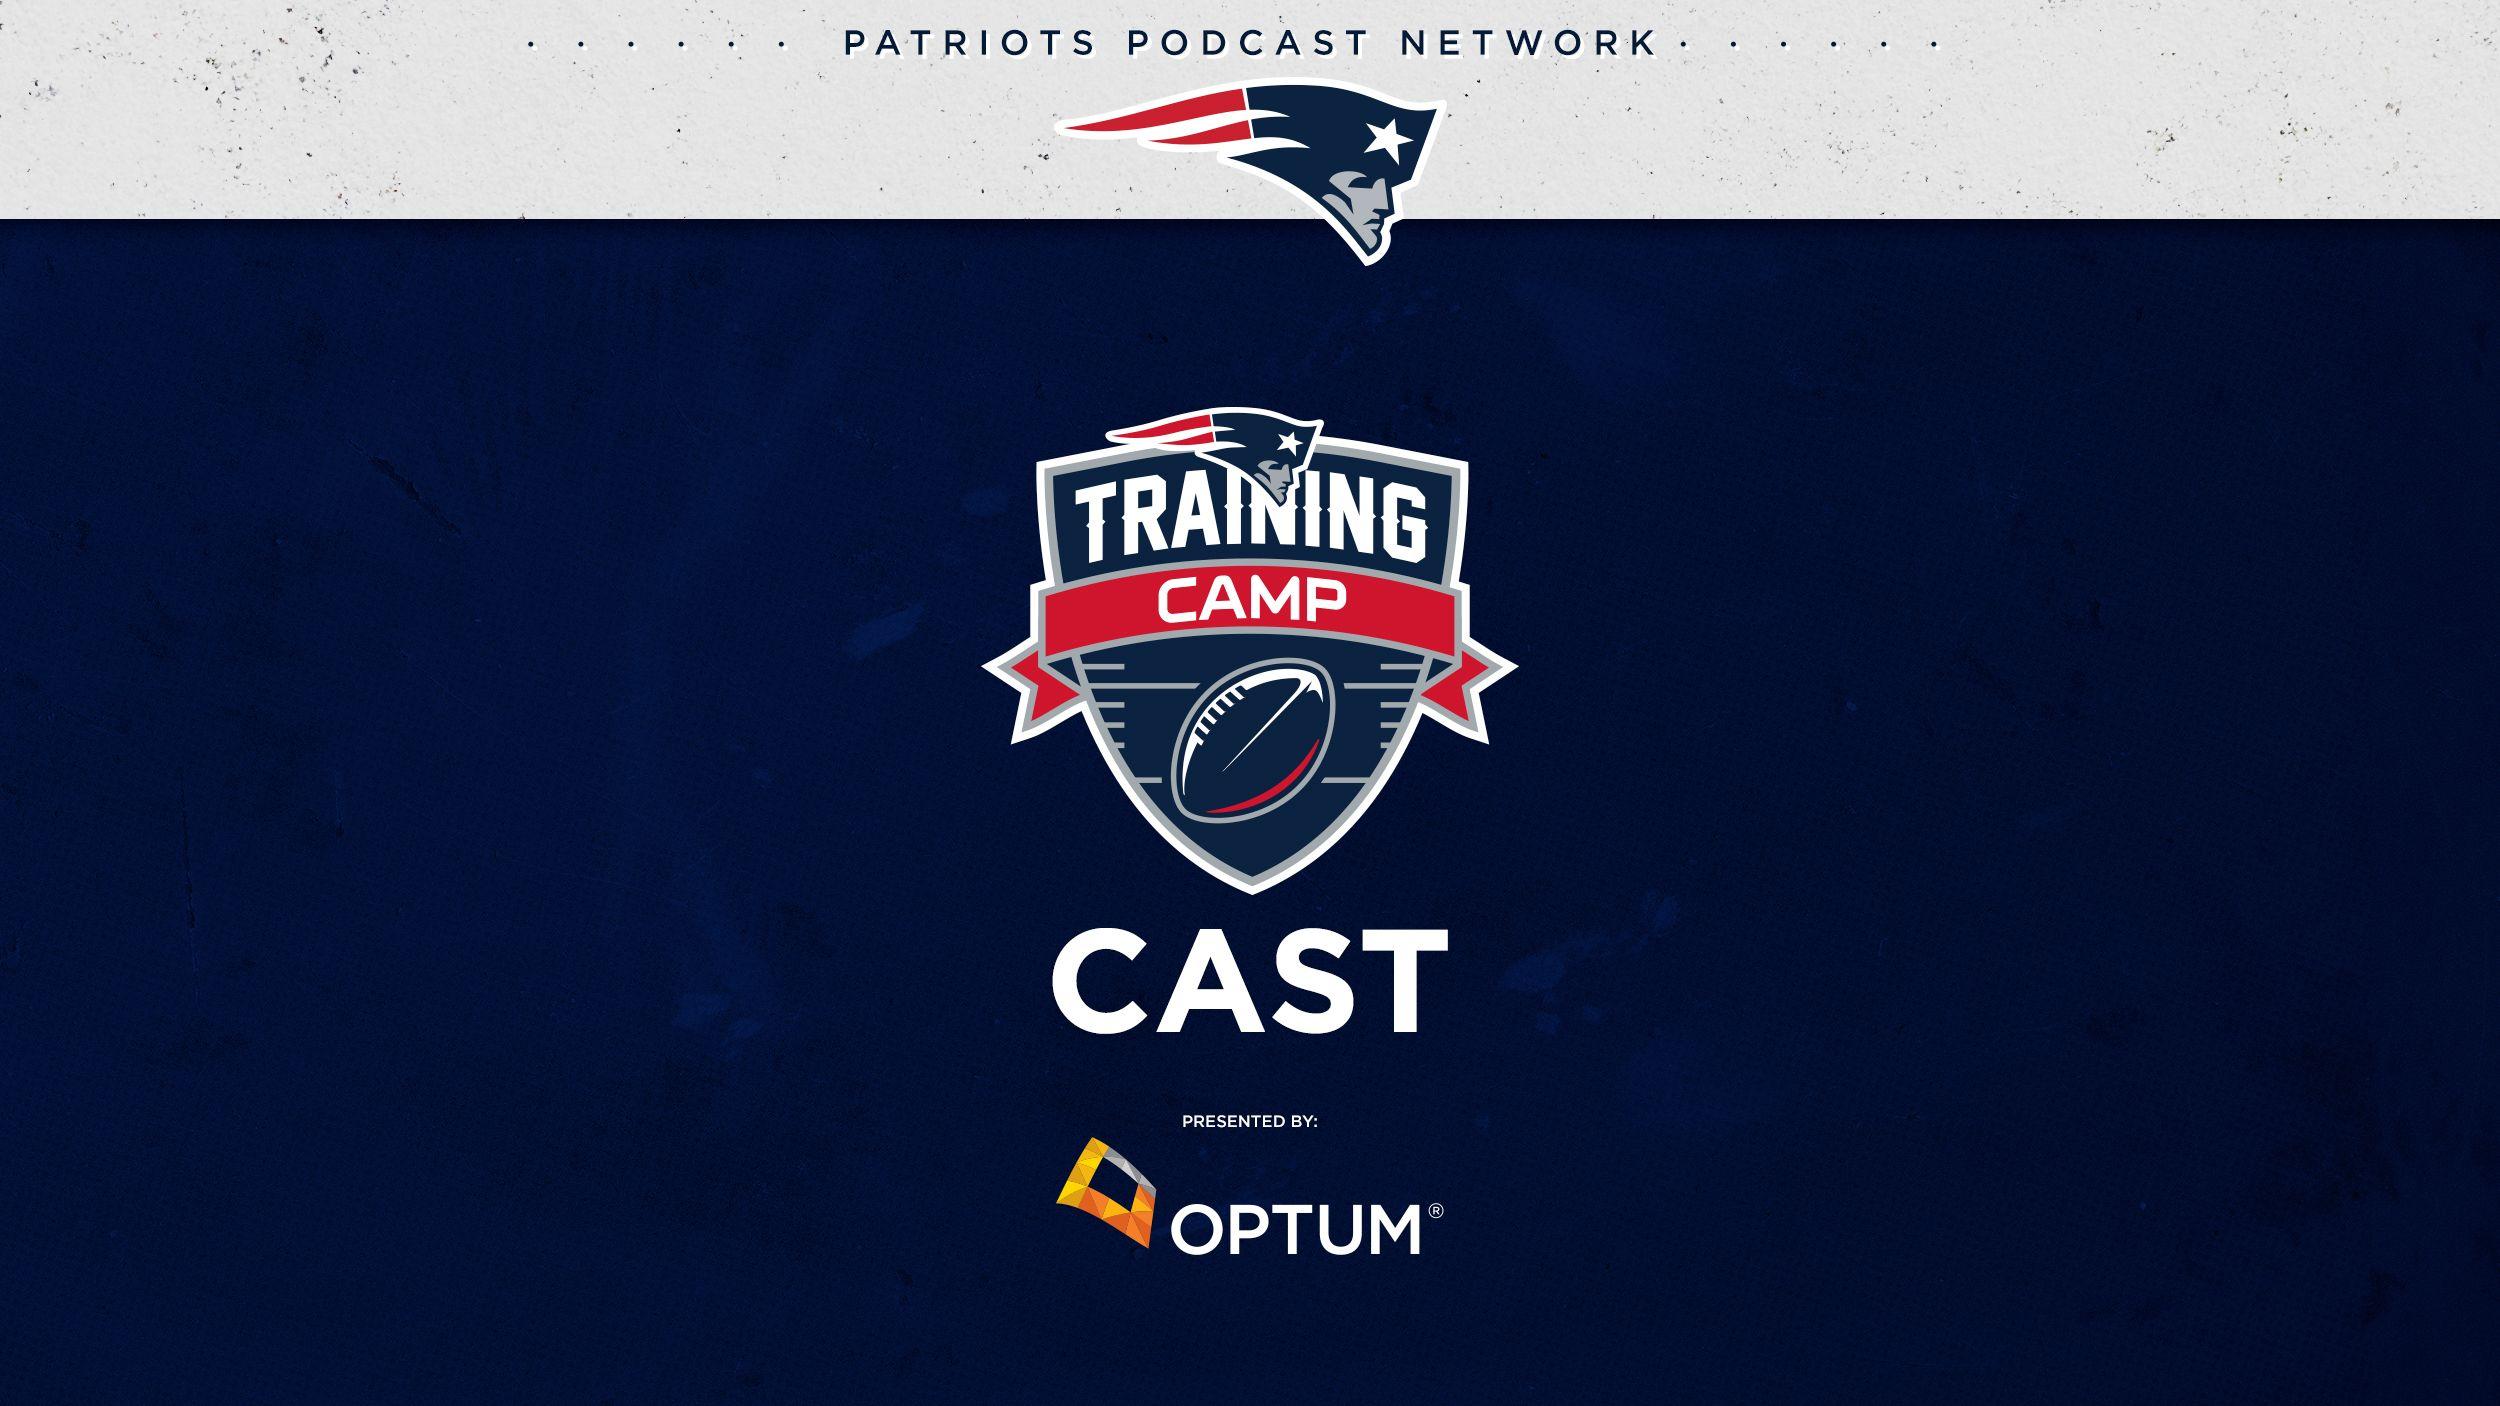 Training Camp-Cast